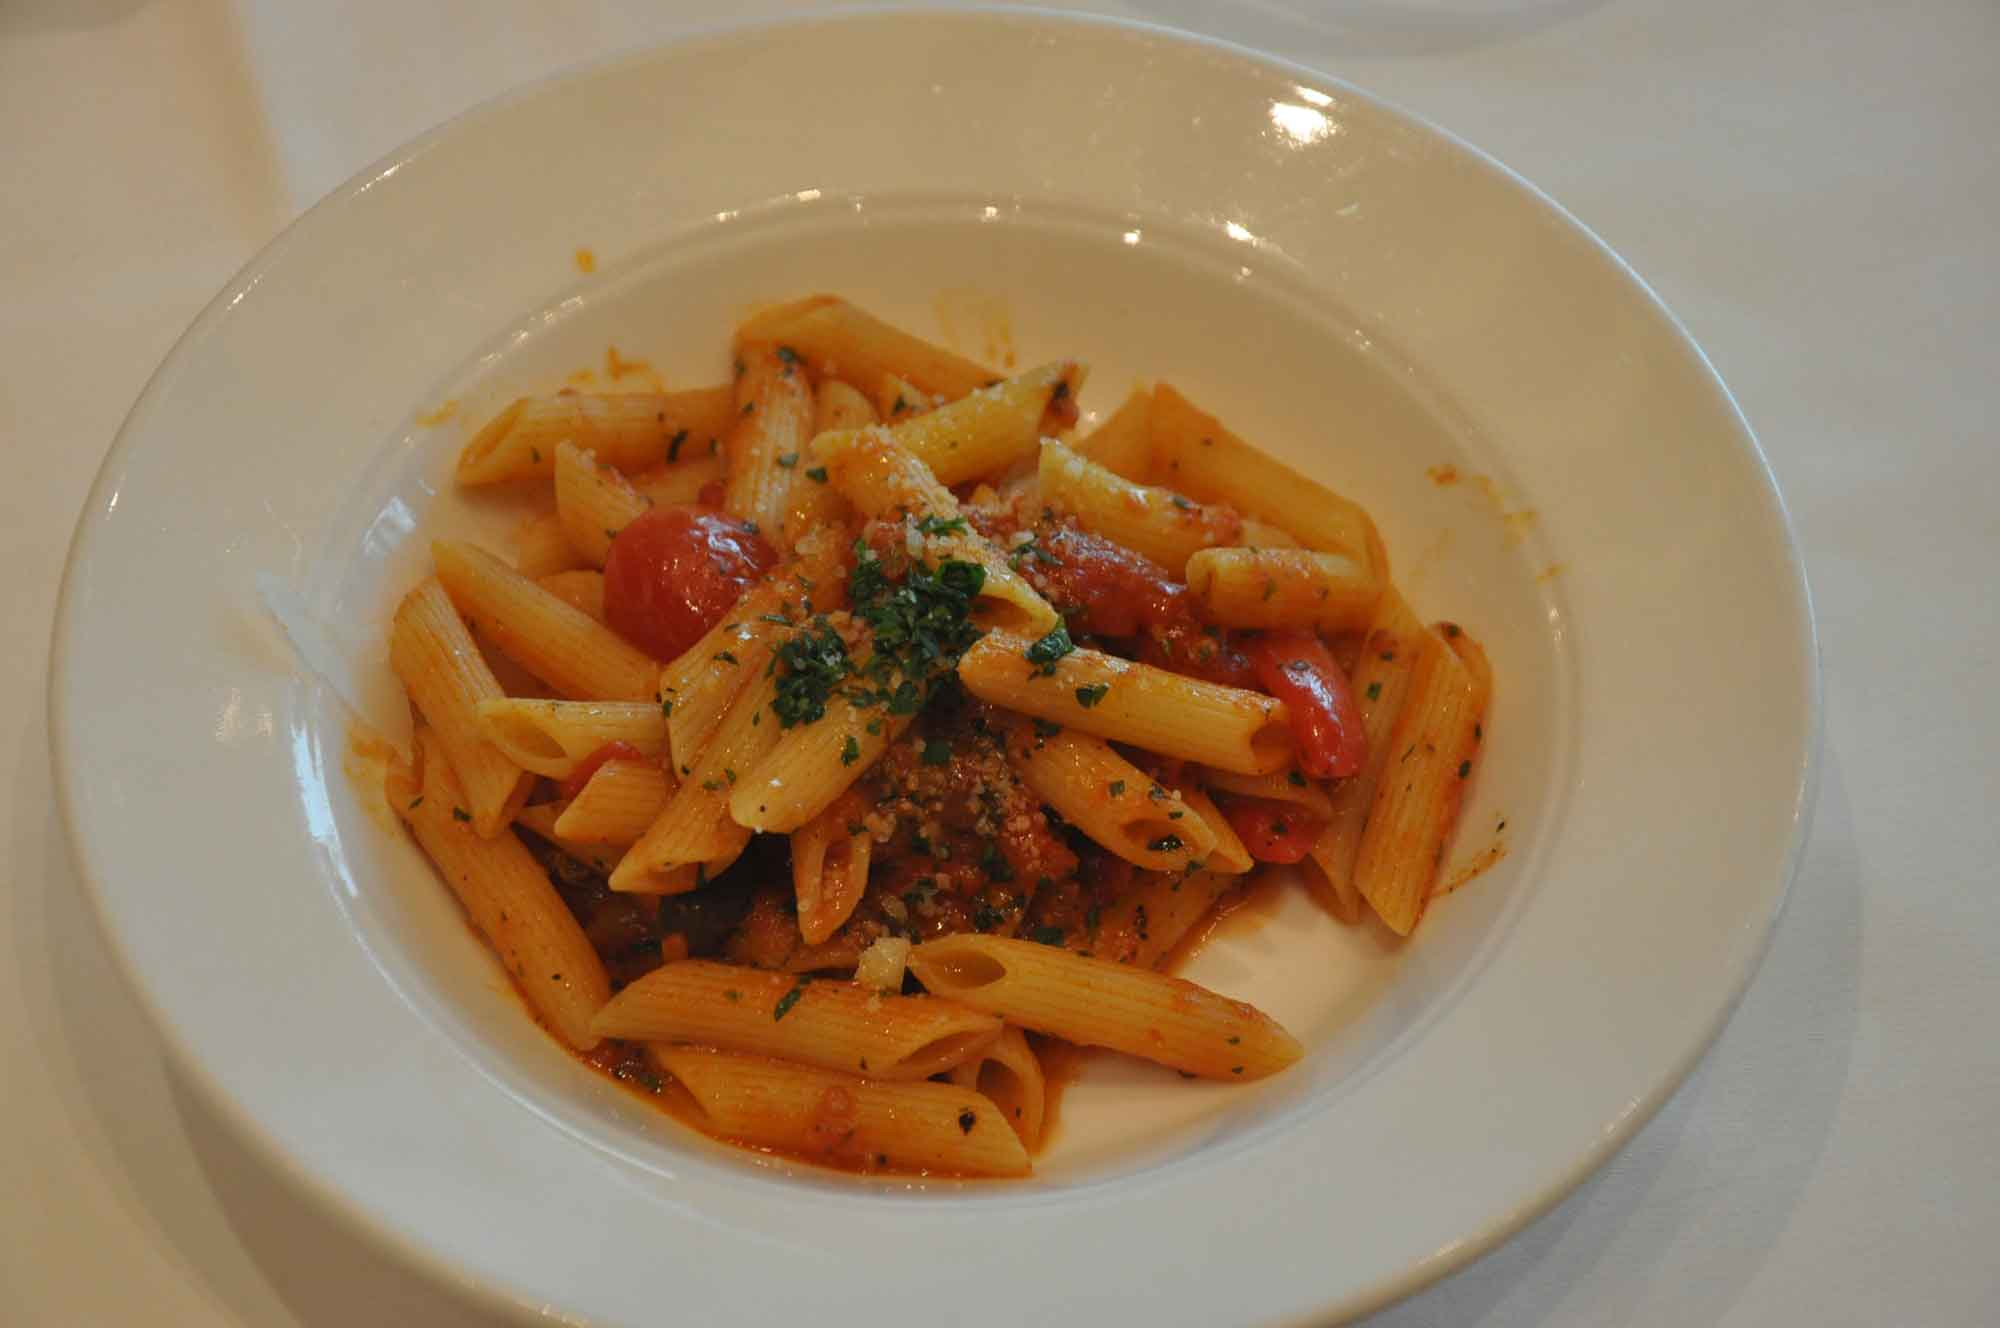 Portofino Macau plate of pasta